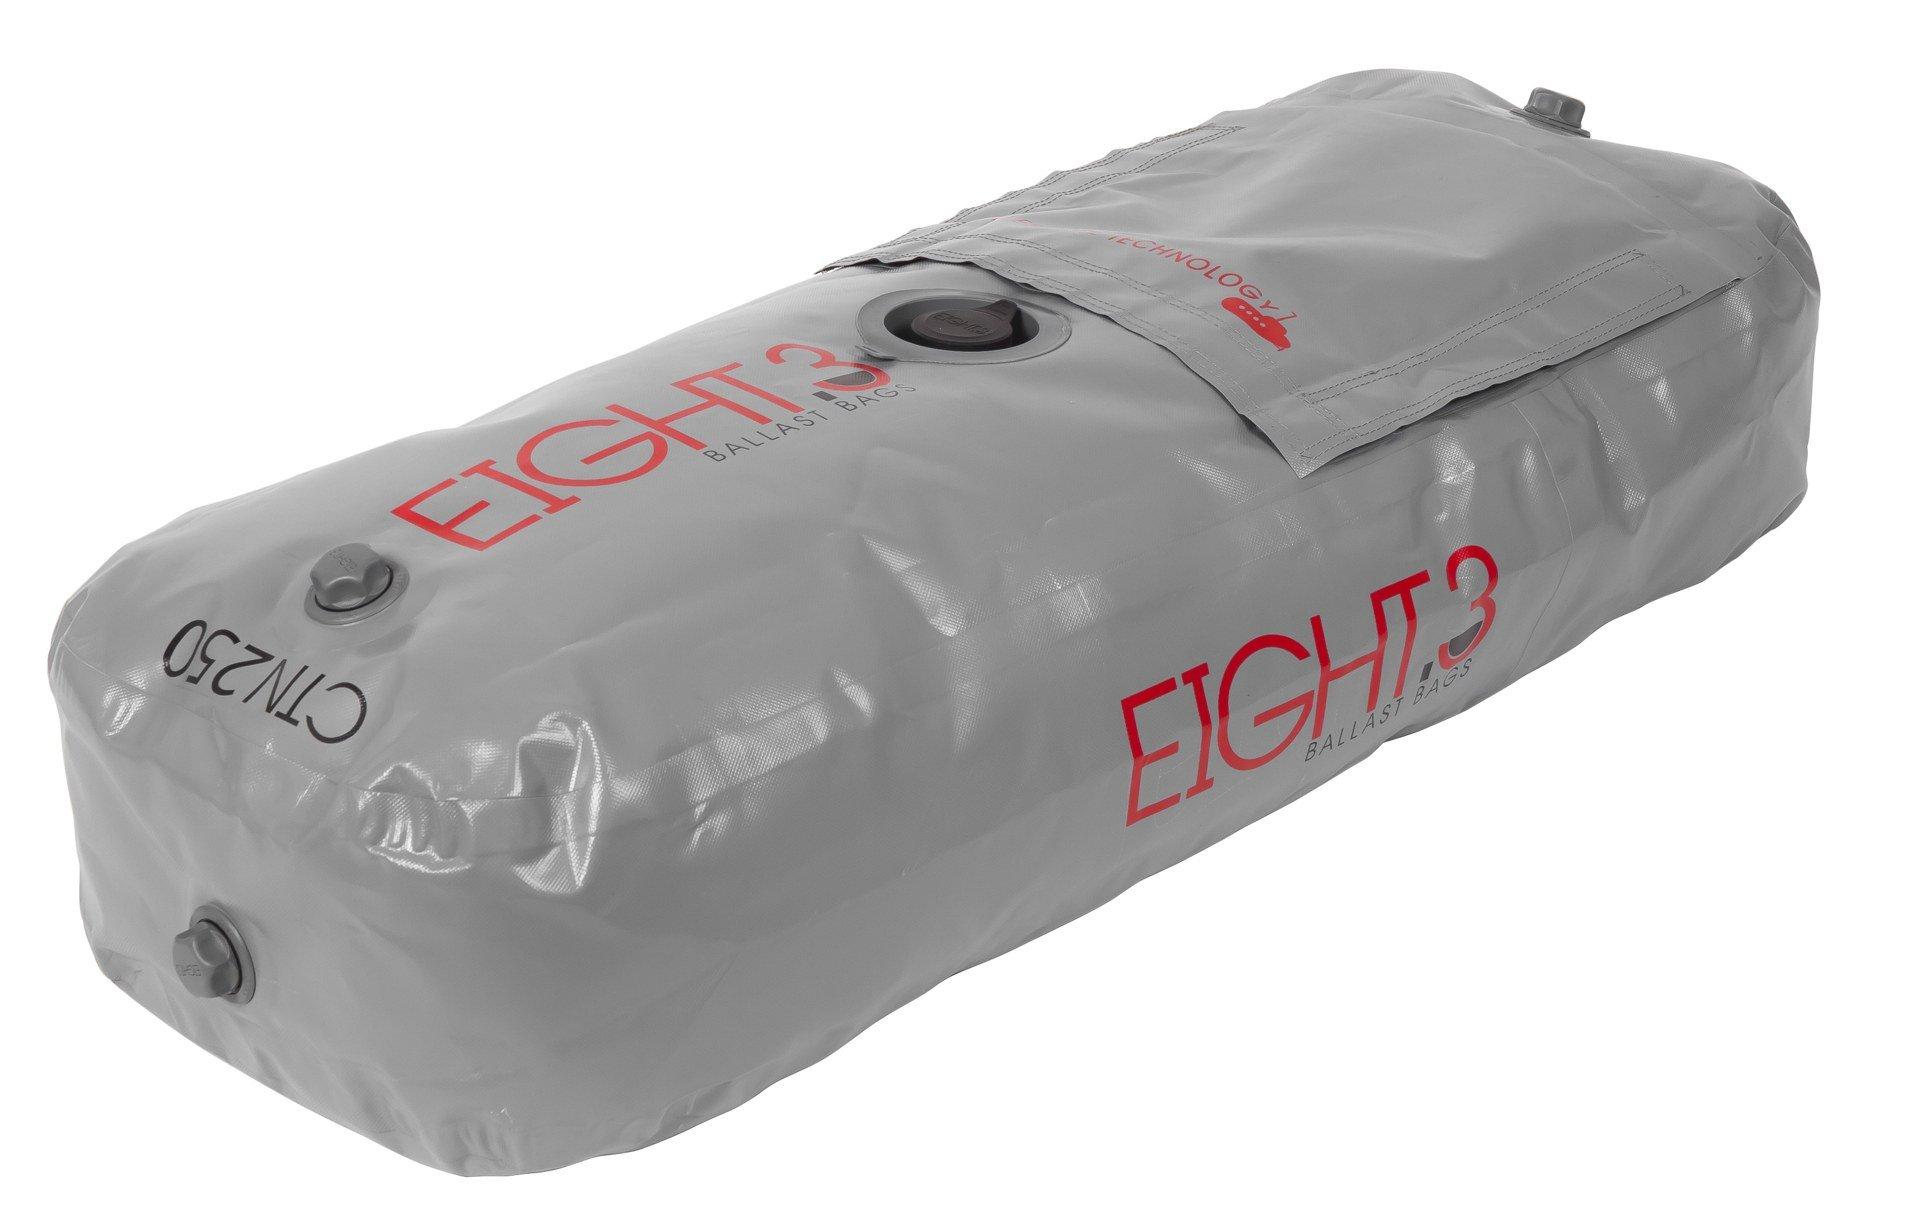 Eight.3 Telescope Locker/Seat Ballast Bag Sz 250lbs